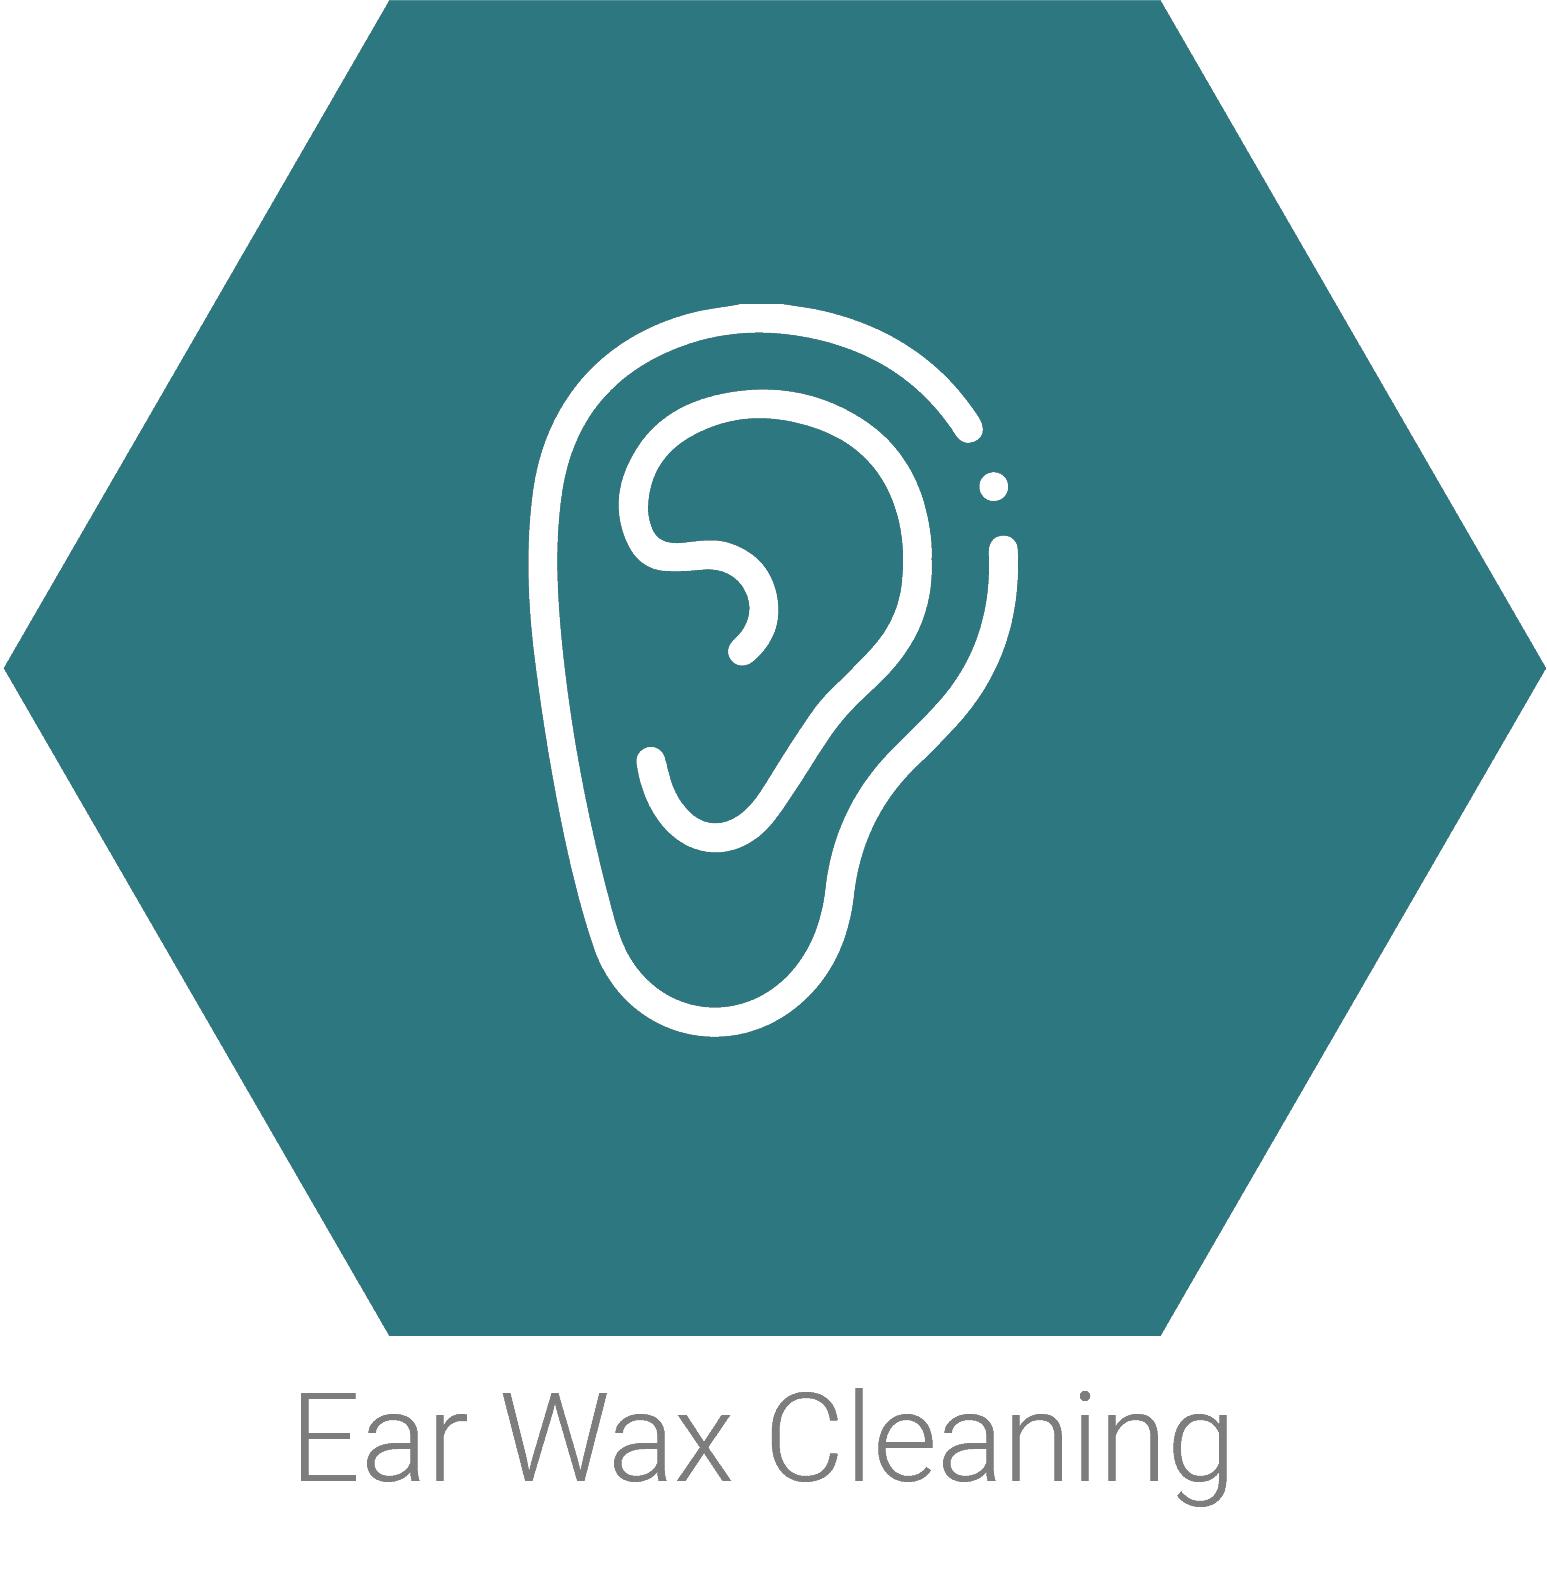 Ear Wax Cleaning